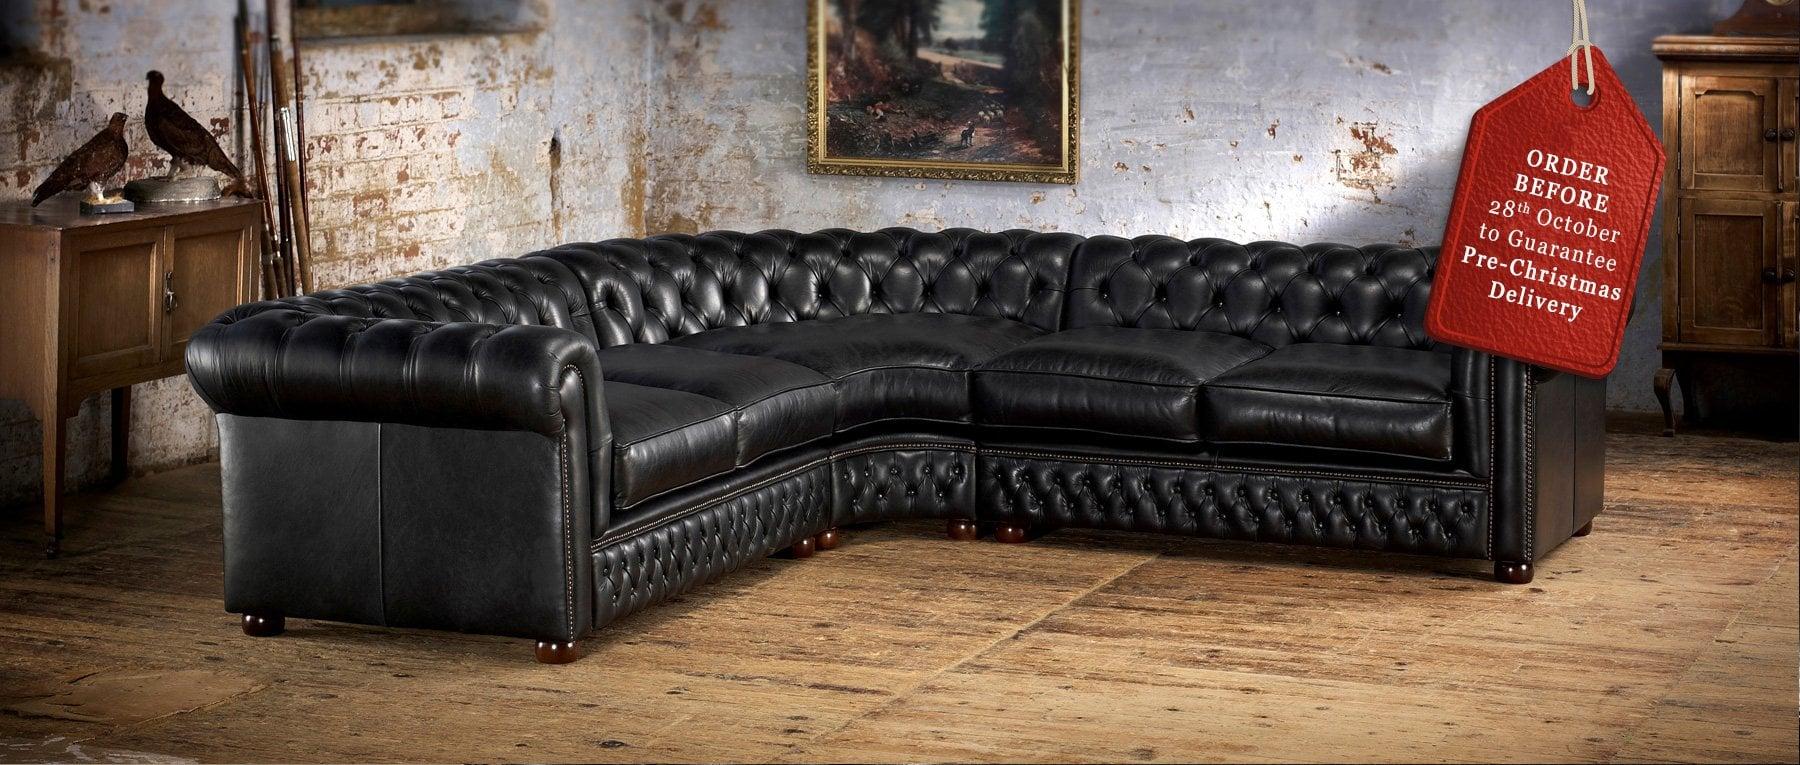 Traditionallybritish Furniturehandmade In Britain Using Traditional Techniquesview Now Over 50 Sofa Designs